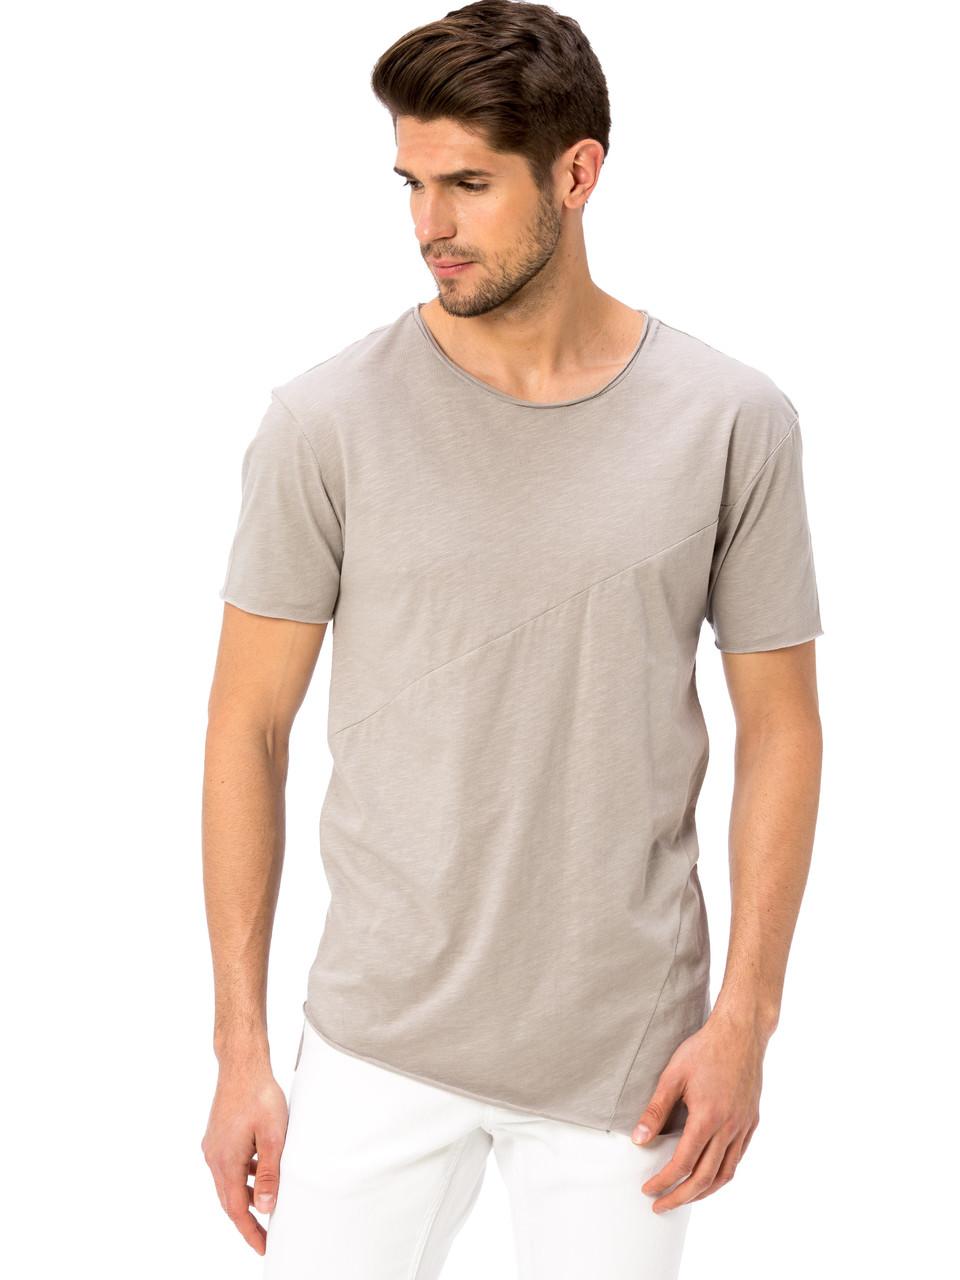 Бежевая мужская футболка LC Waikiki / ЛС Вайкики с ассиметричными швами